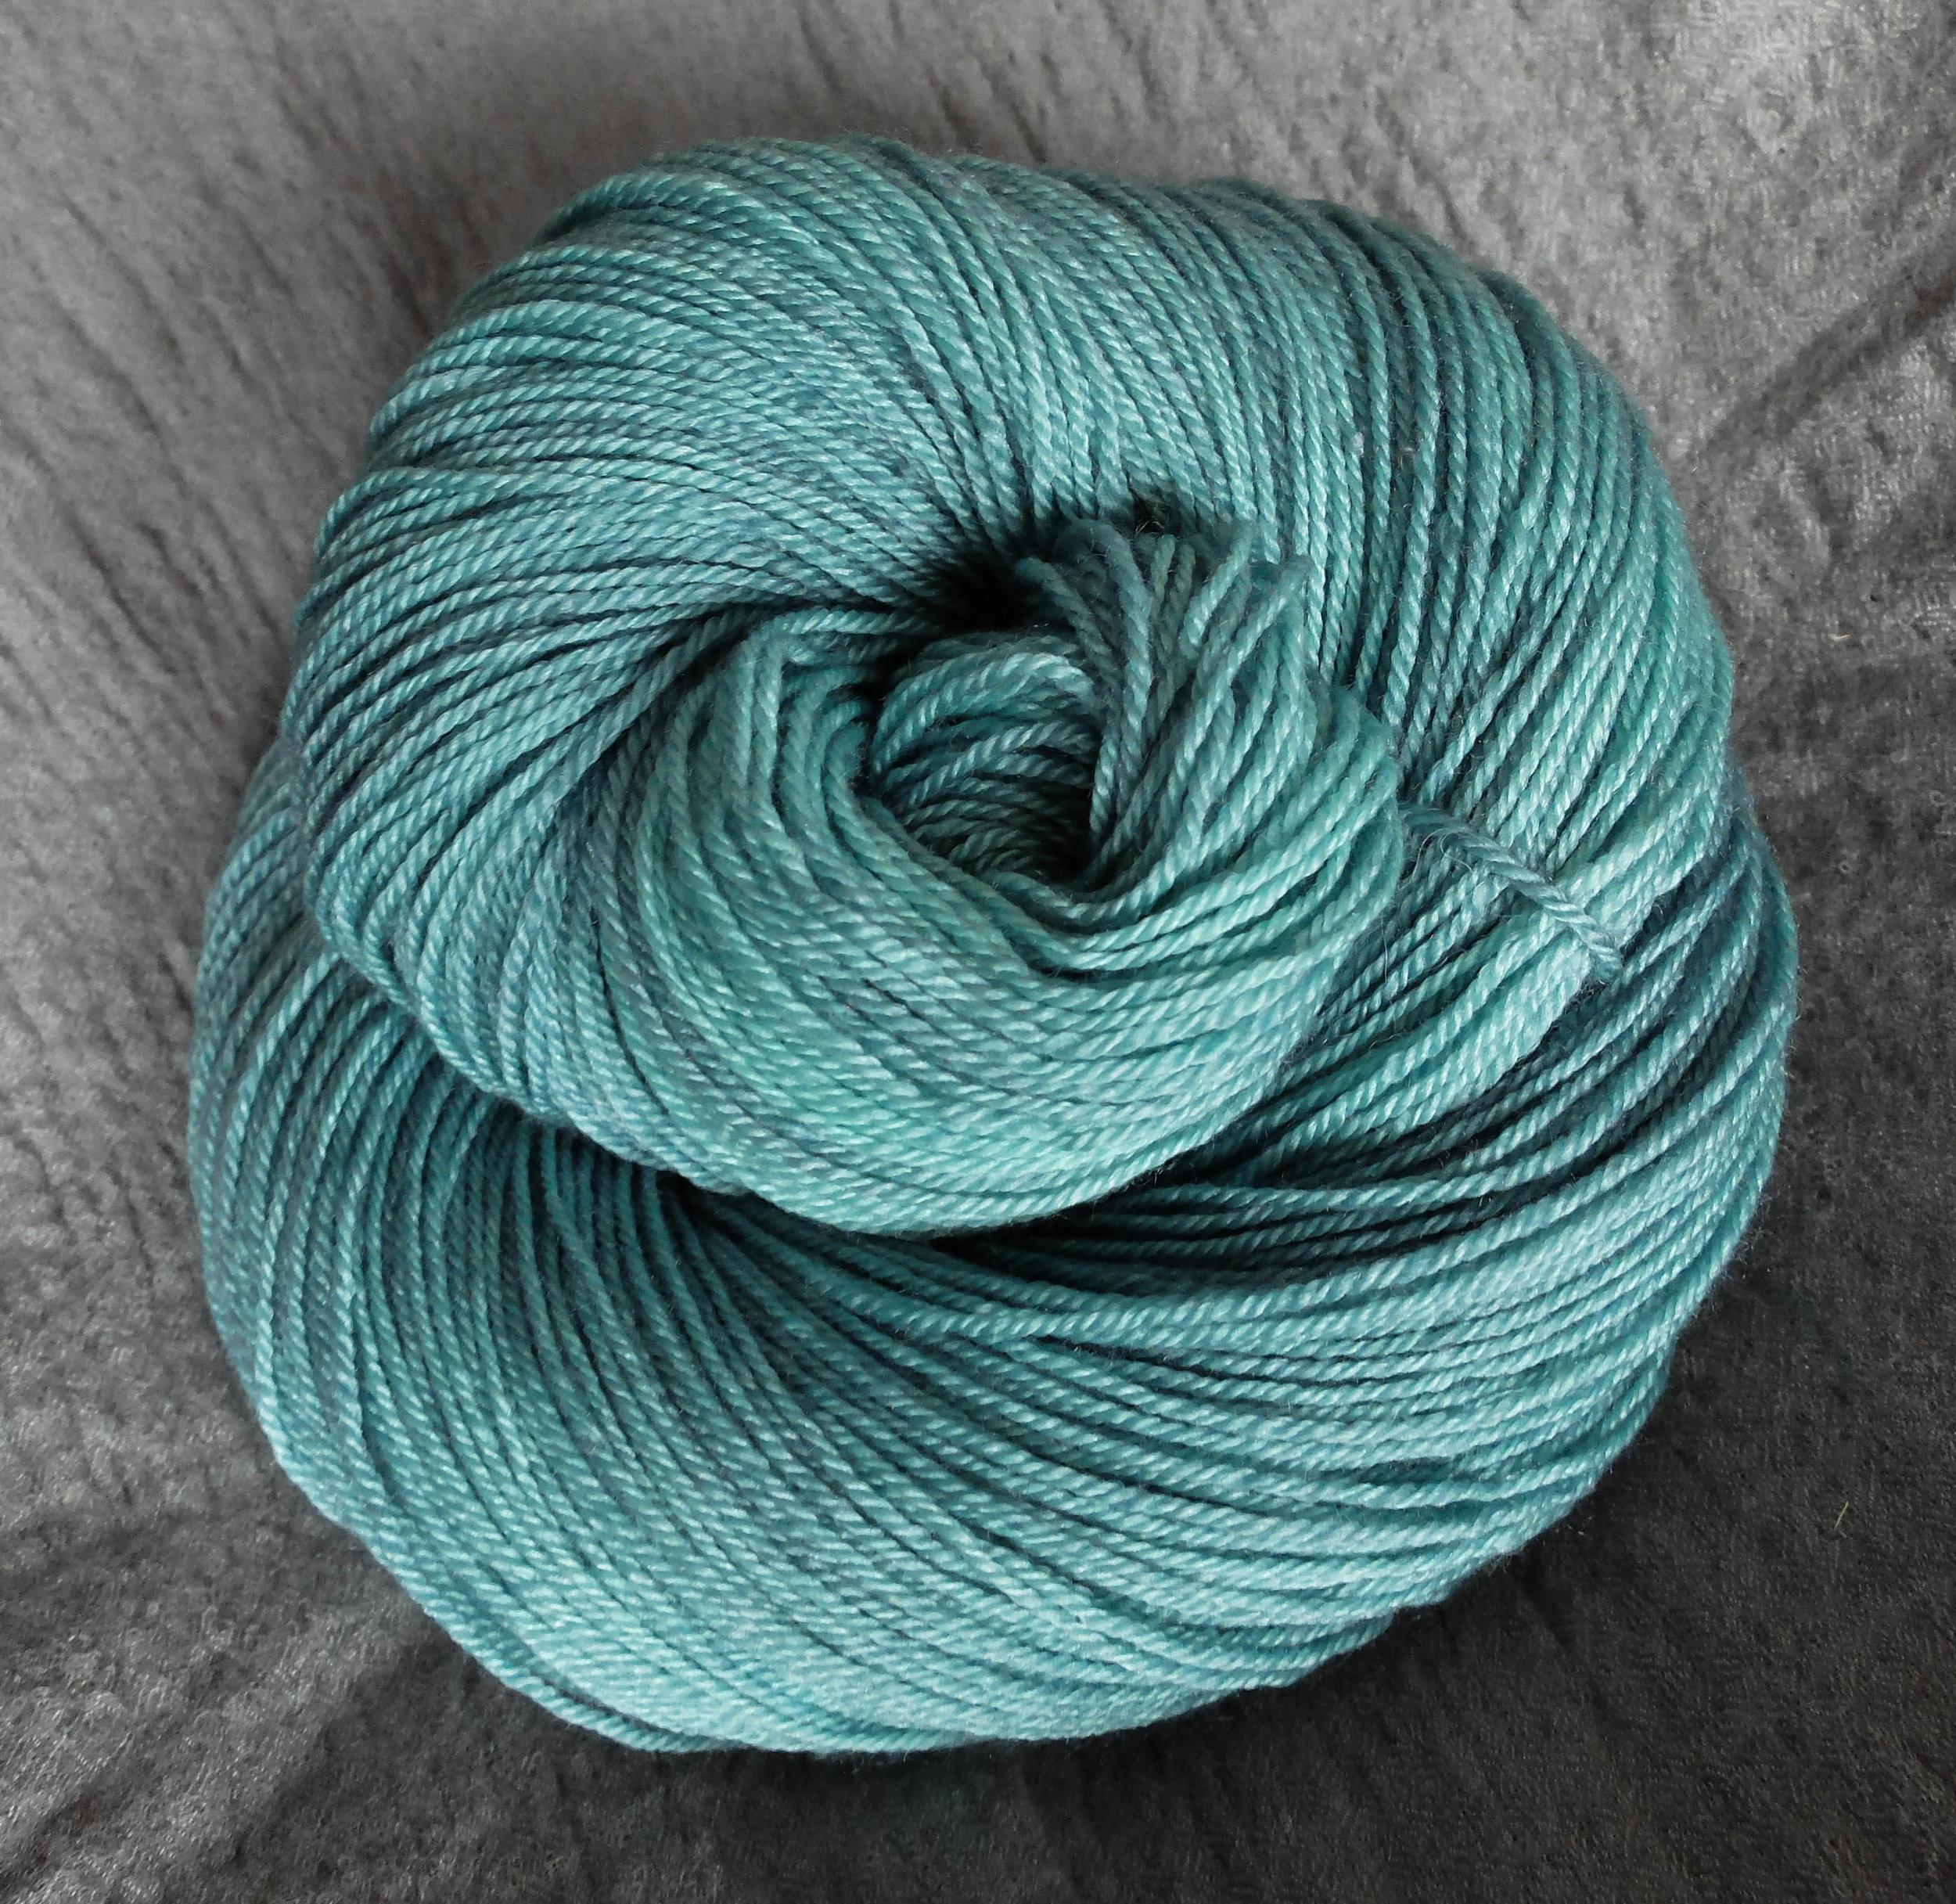 Volva shown on Fingering - BFL/Silk/Cashmere